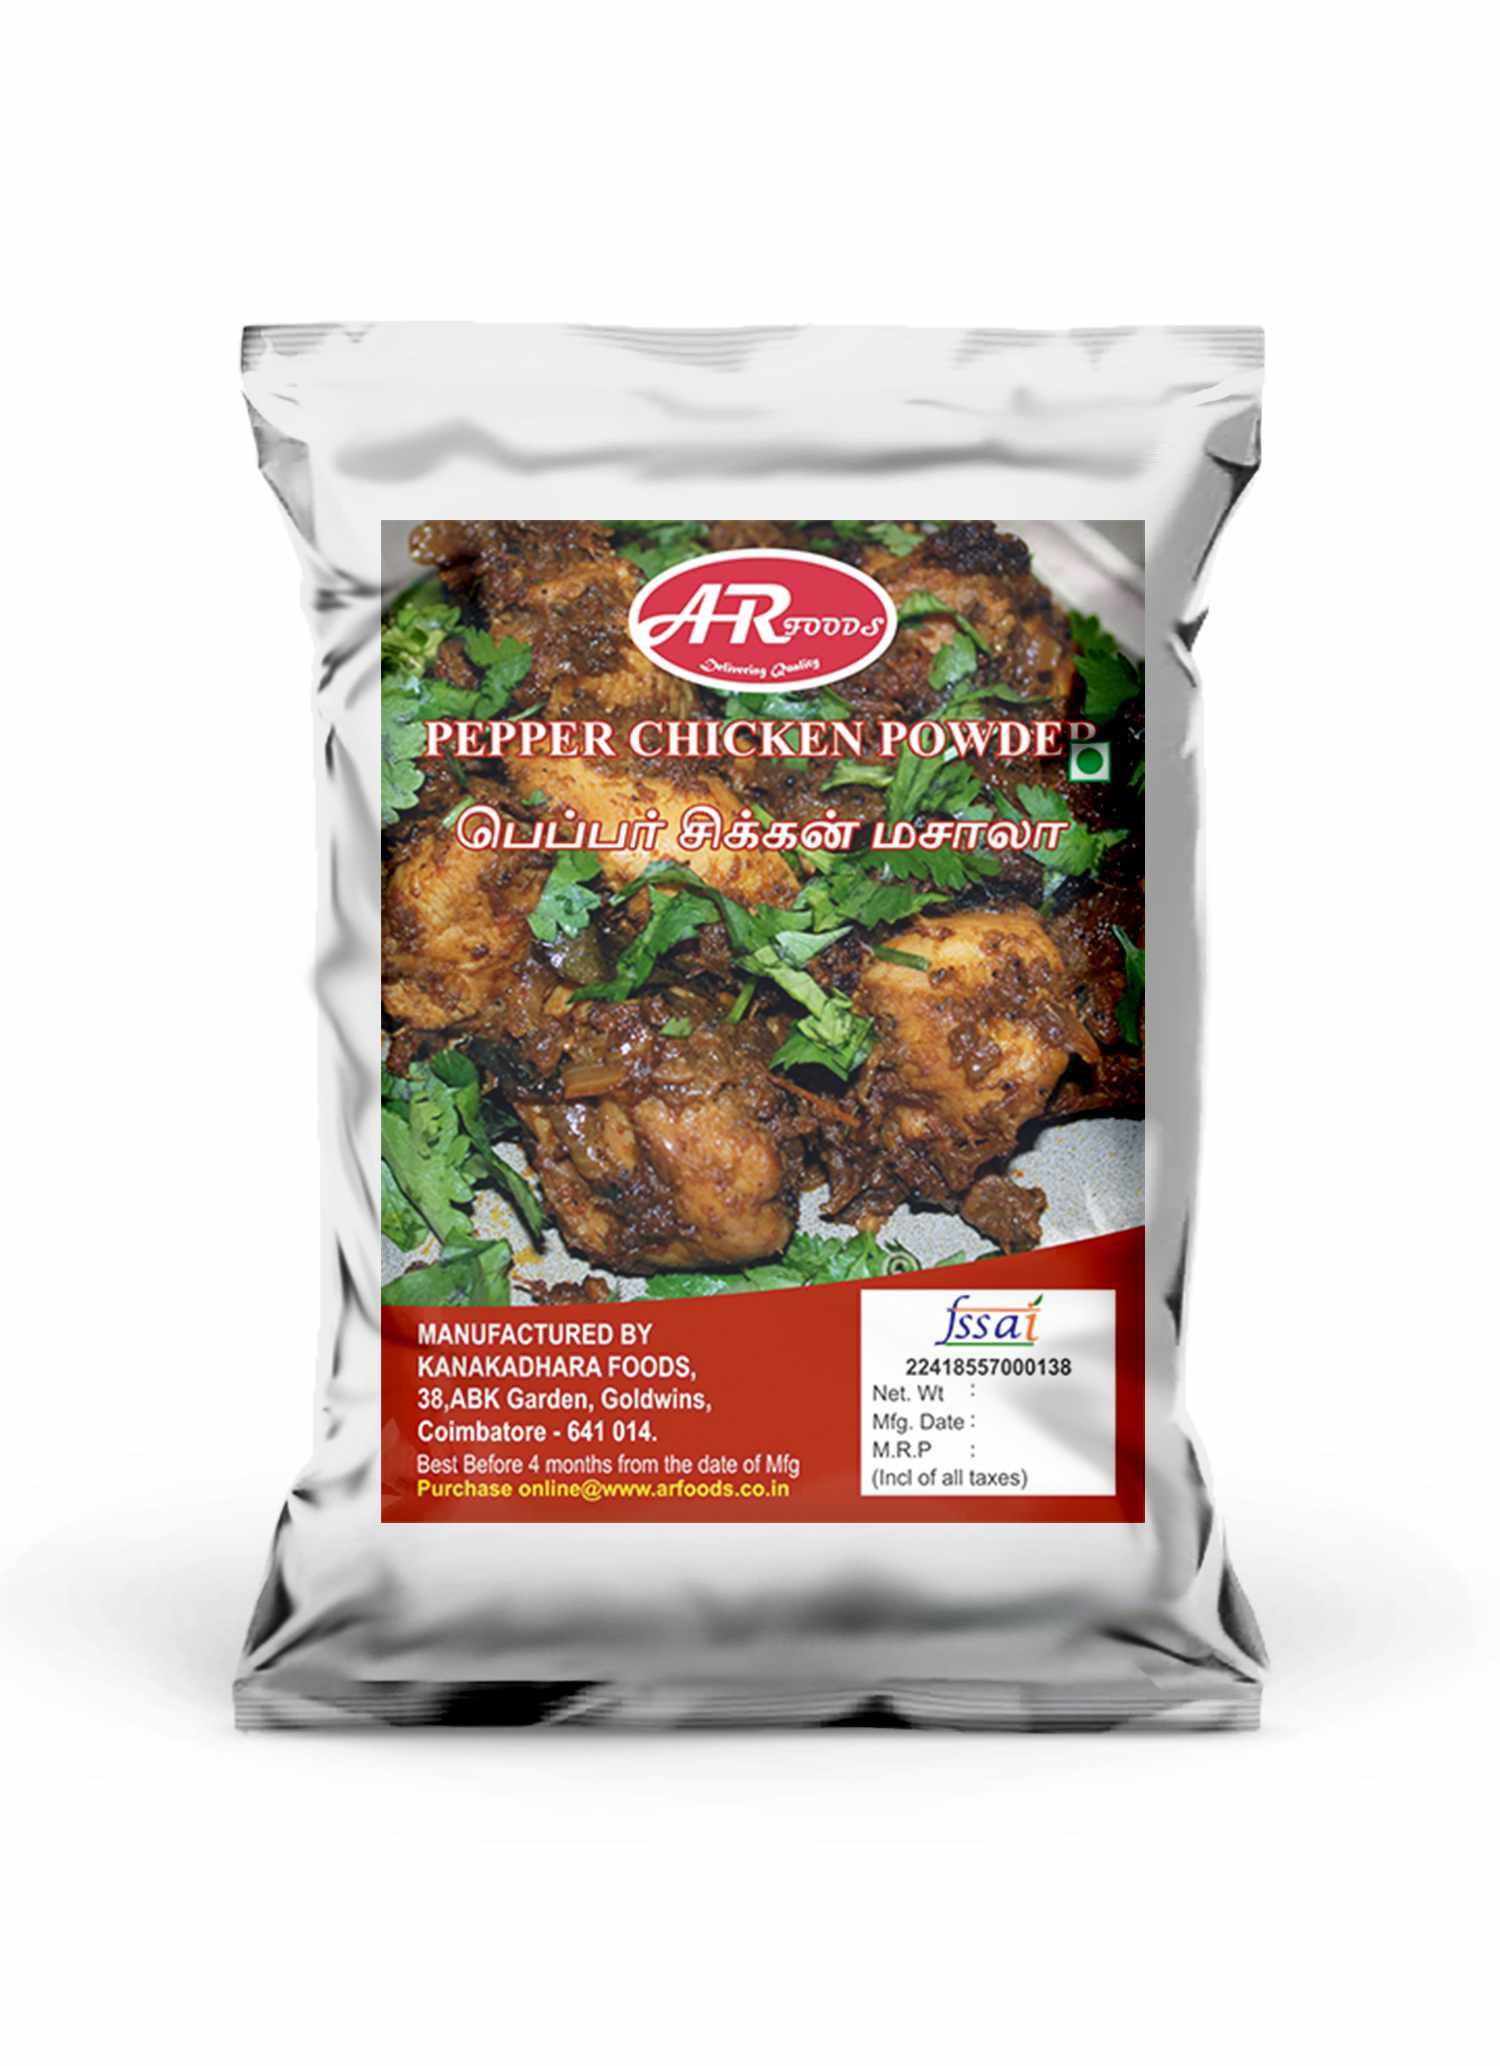 Pepper chicken powder_ar_foods_coimbatore